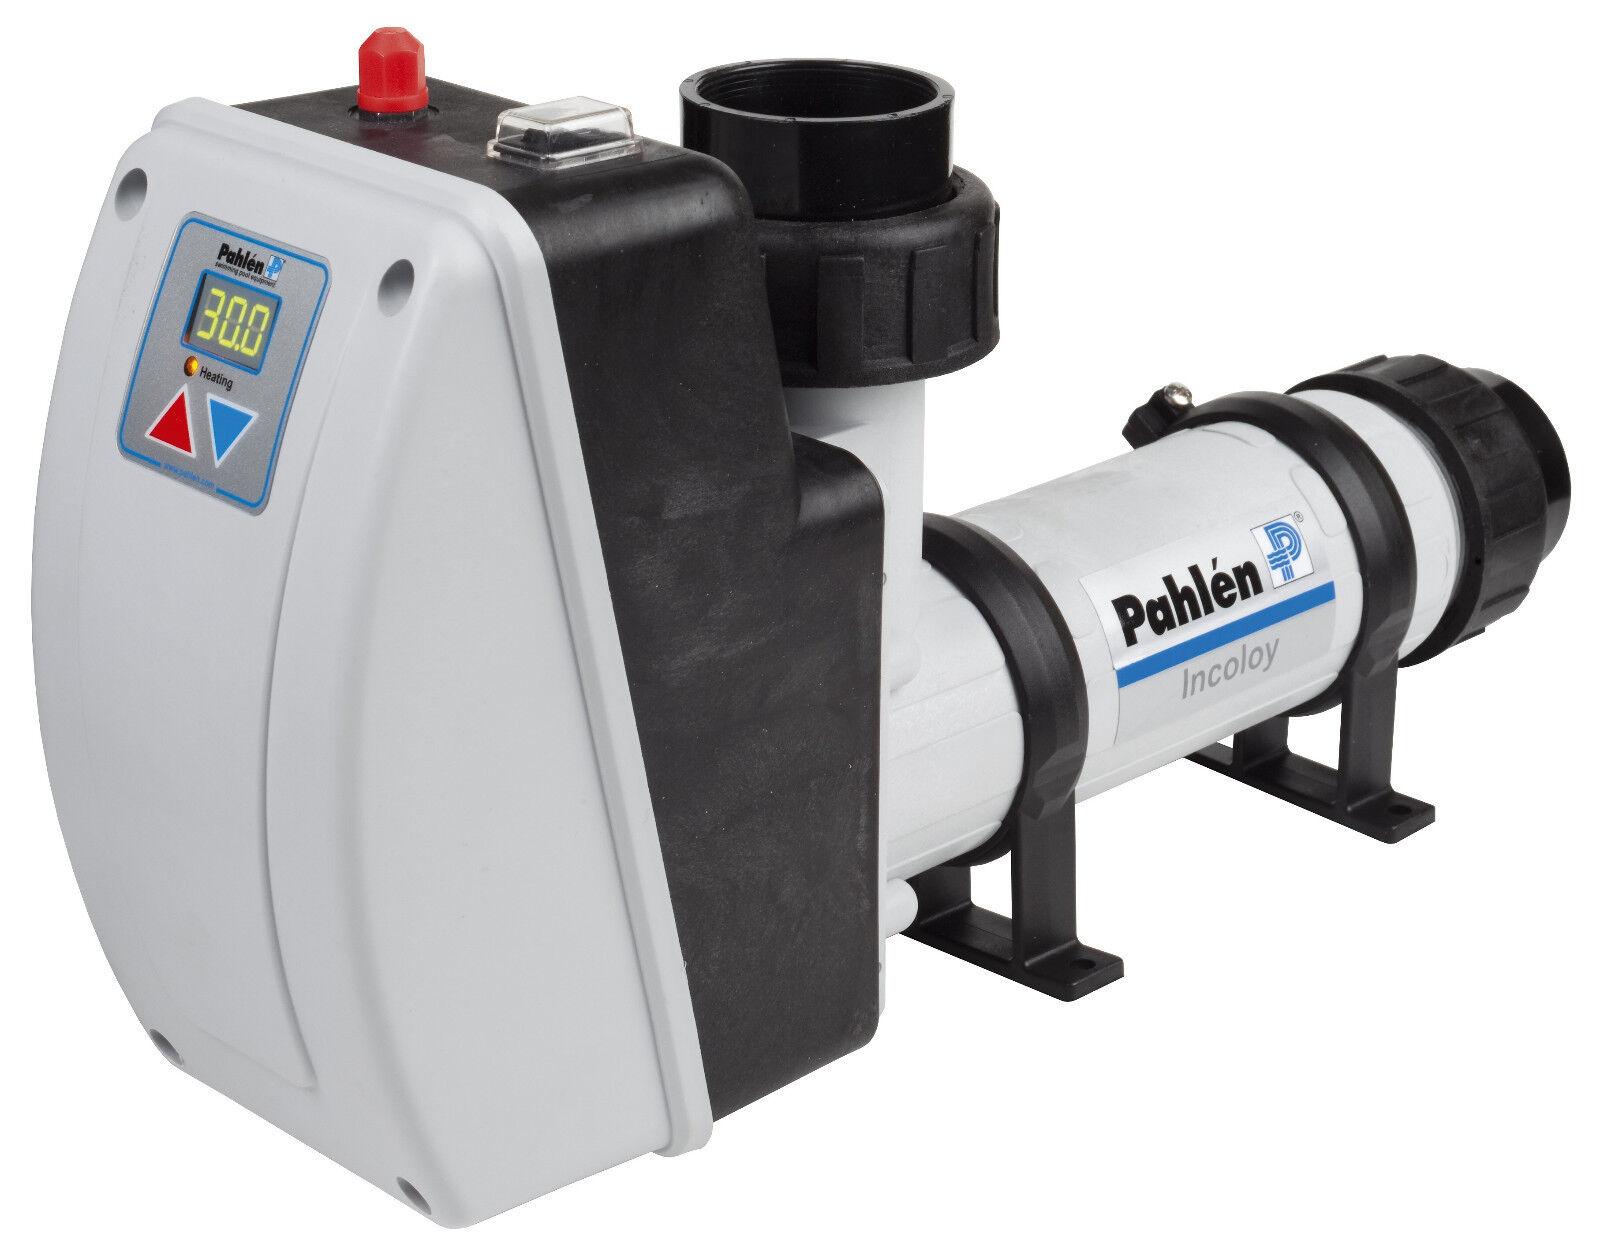 Pahlen Elektroheizer Aqua HL Digital Kunststoff/Titan 6kW 40m³ Pool Heizung